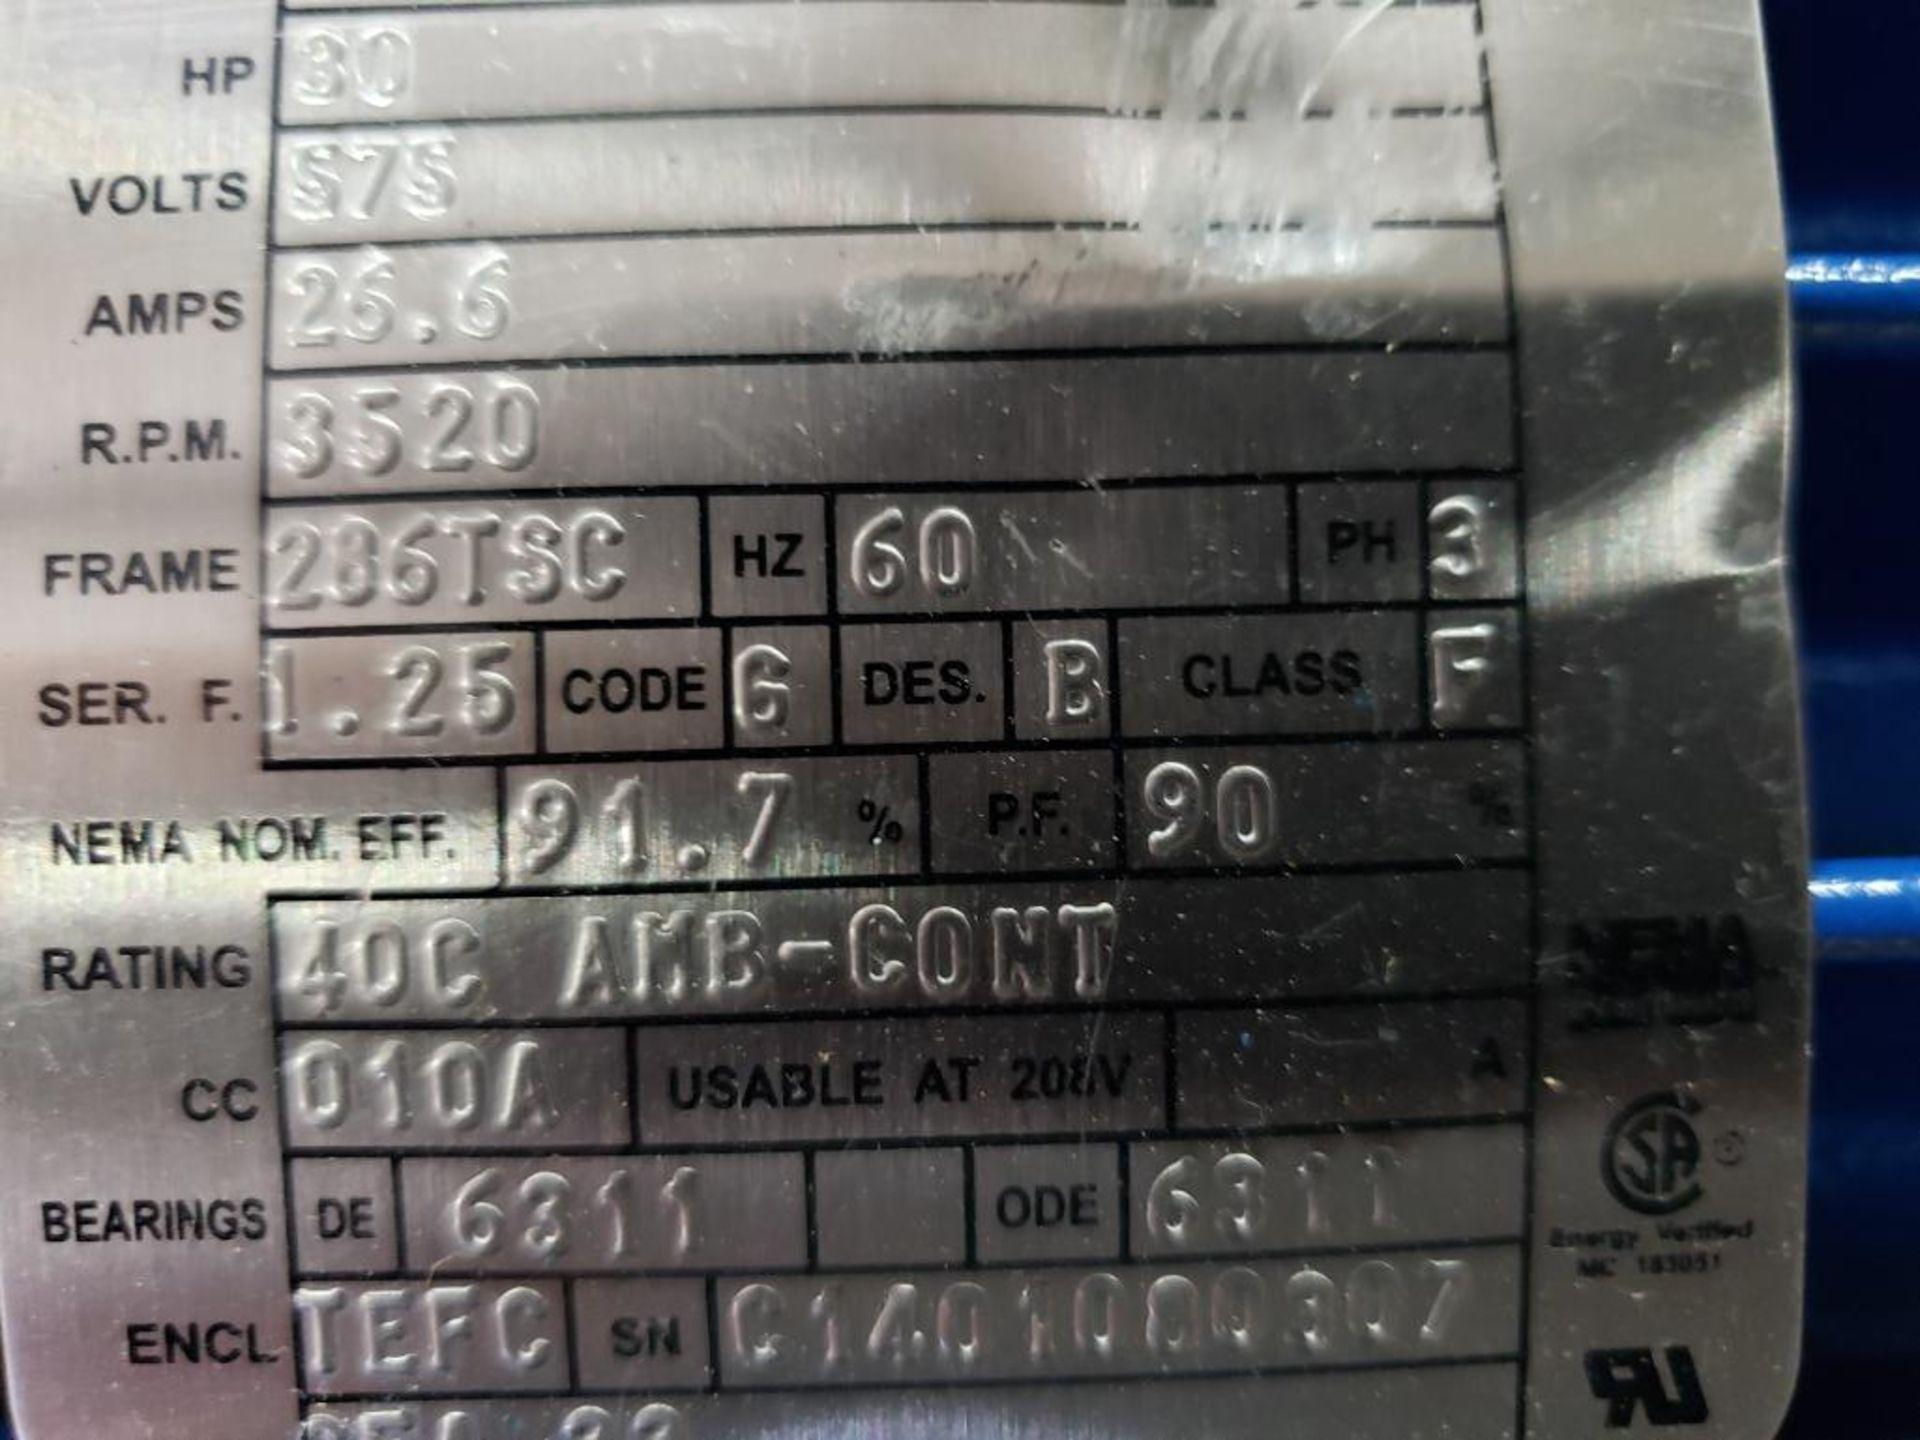 30HP Baldor Reliance 3PH motor. 2013000110. 575V, 3520RPM, 286TSC-Frame. - Image 5 of 12